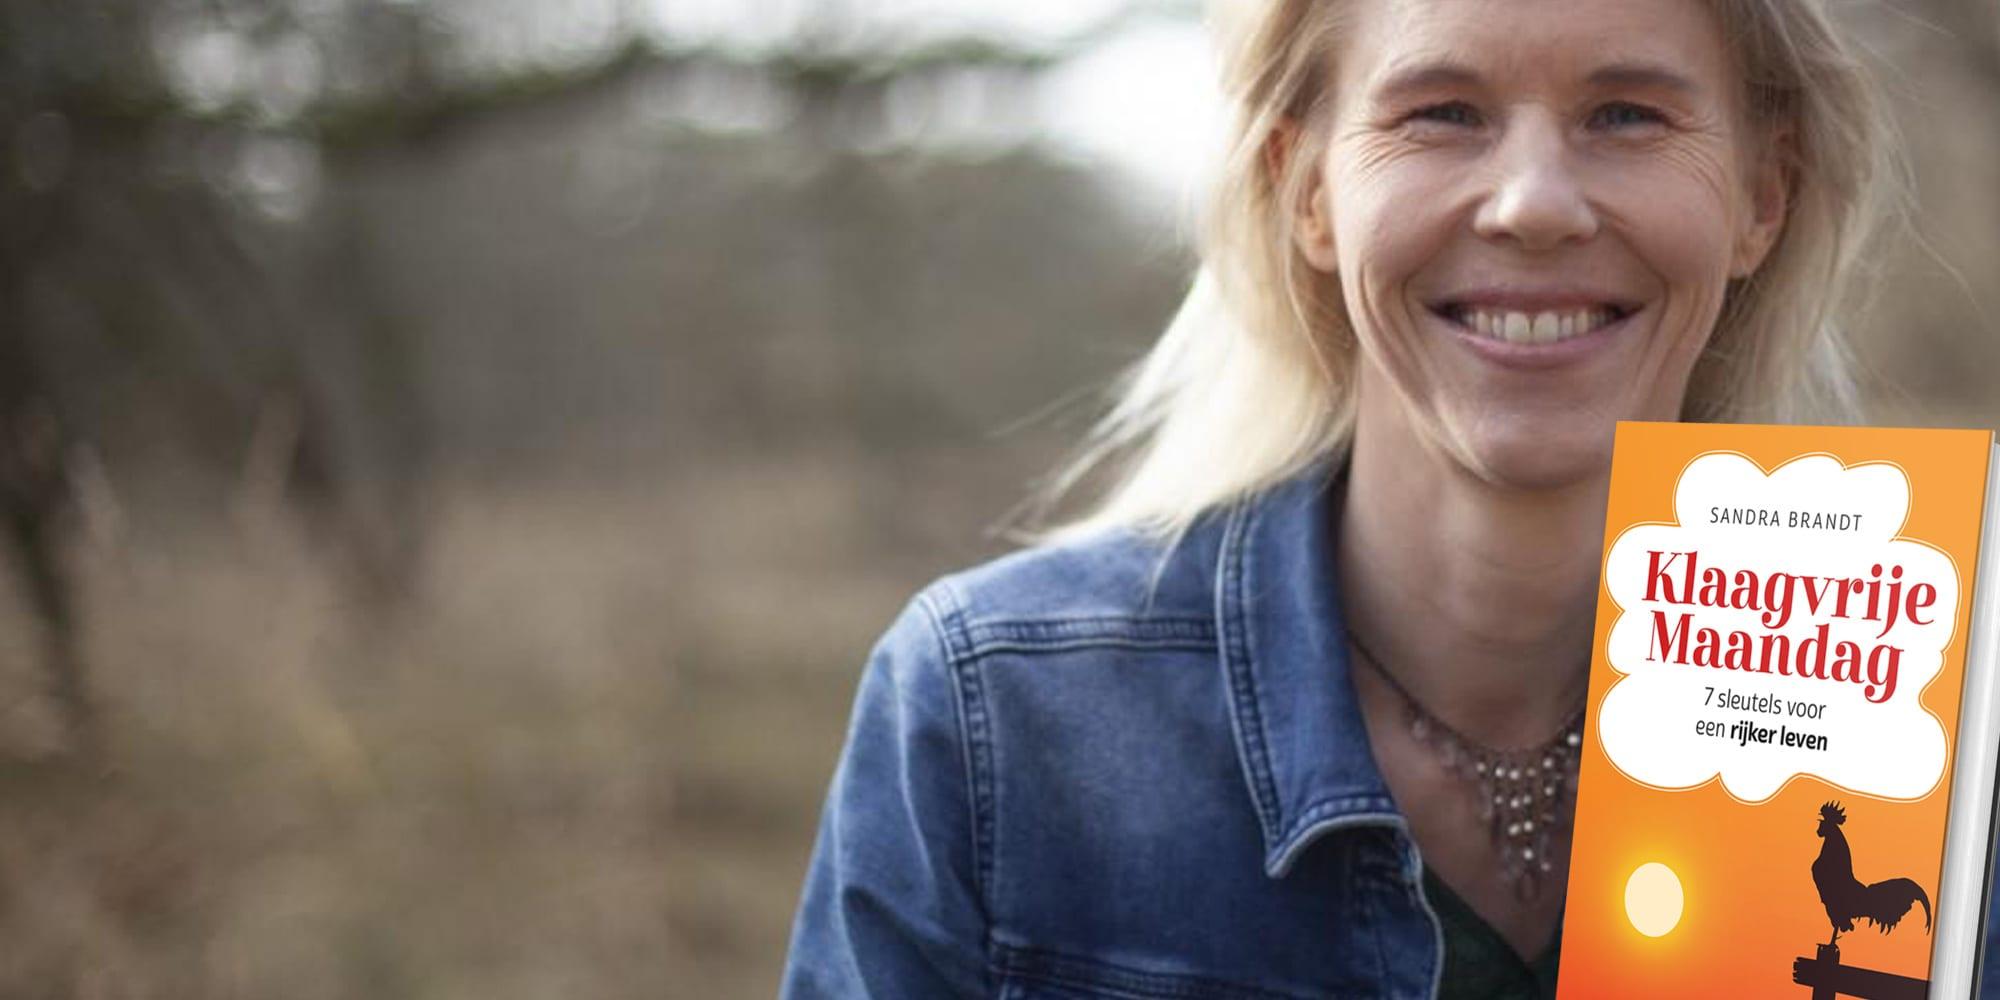 Sandra Brandt Klaagvrije maandag